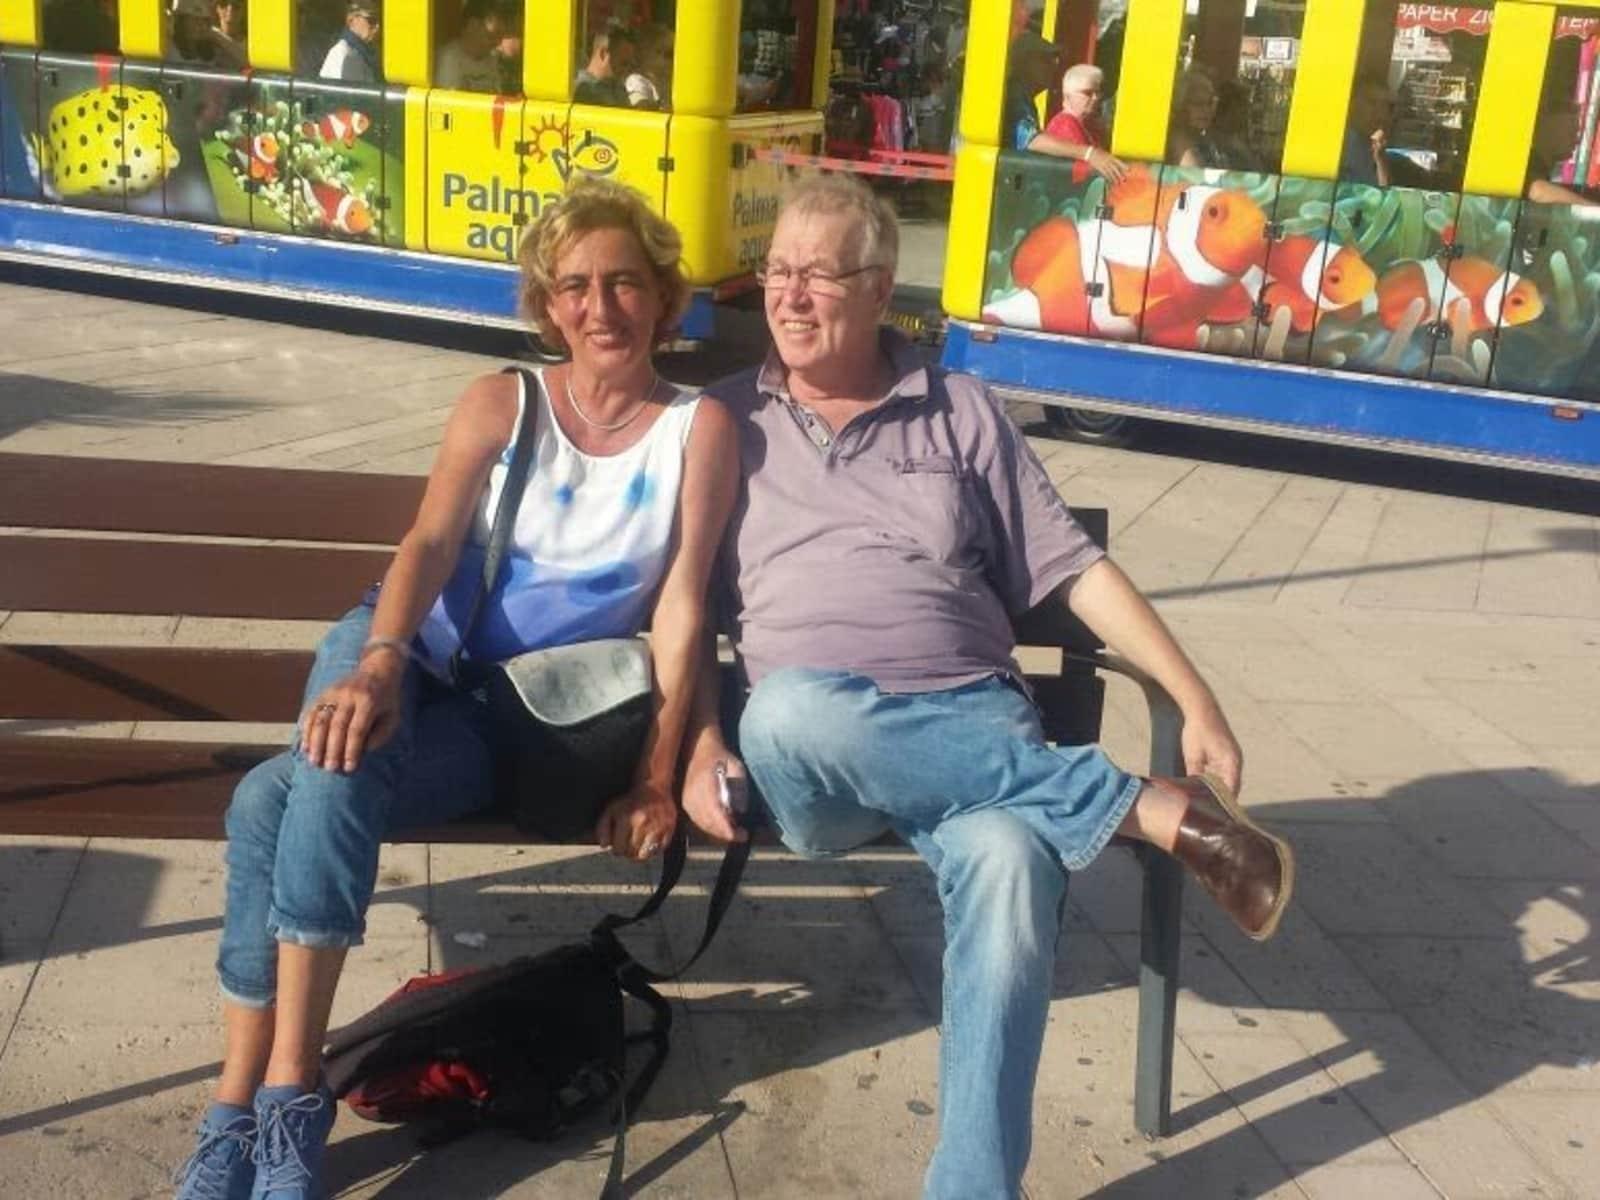 Iris & Michael from Bremen, Germany